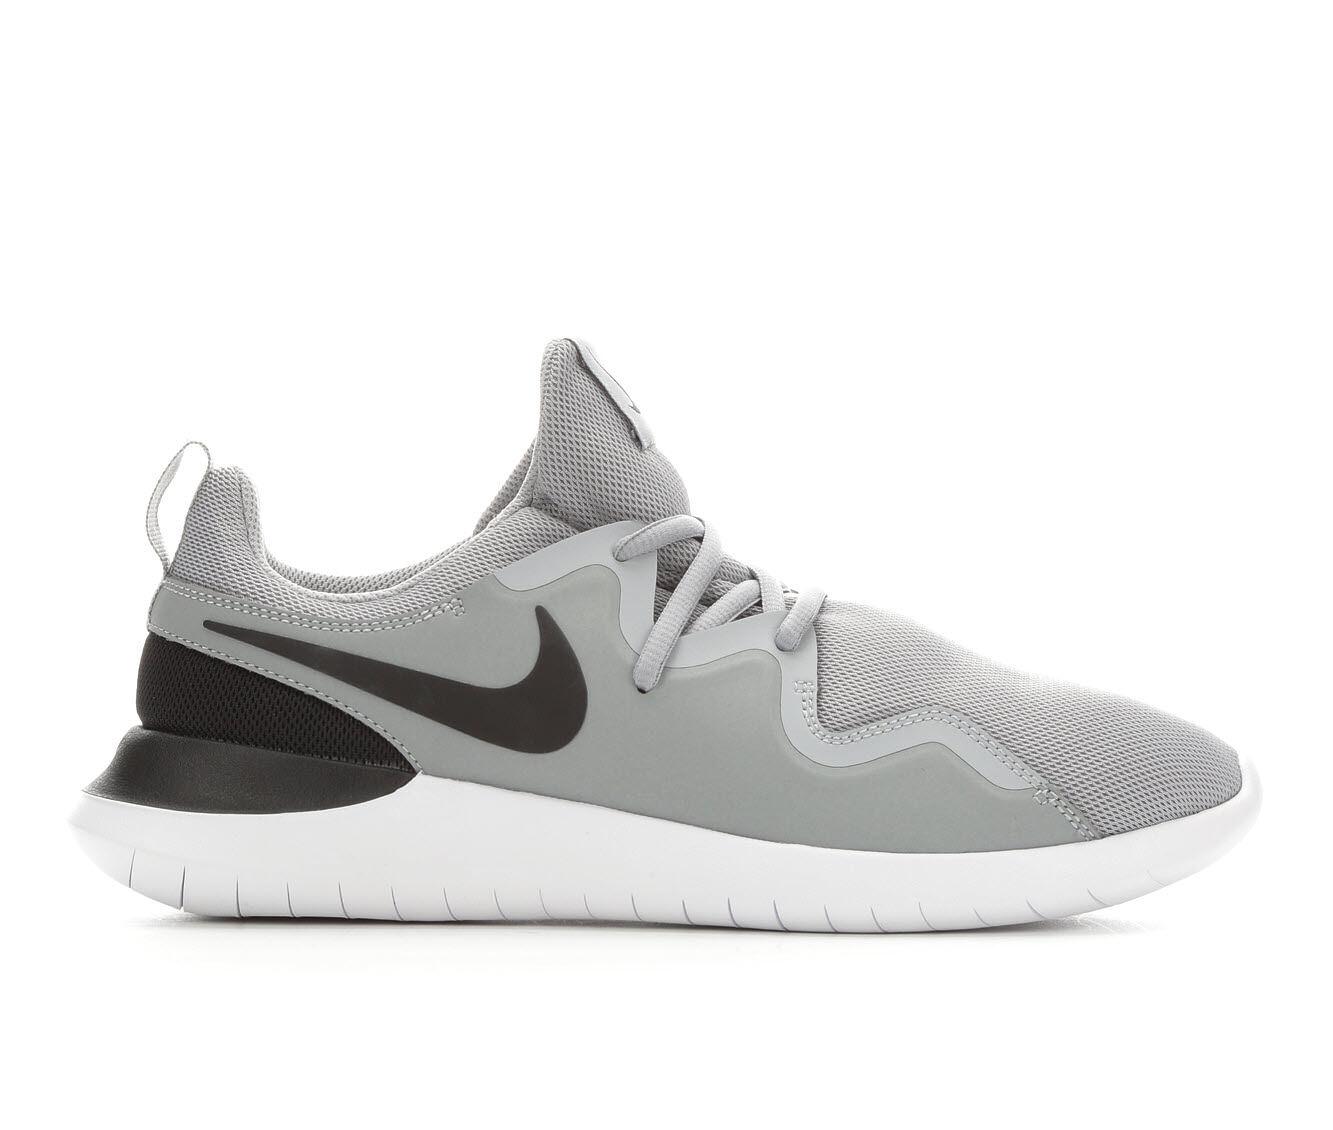 Men's Nike Tessen Sneakers Grey/Black/Whit